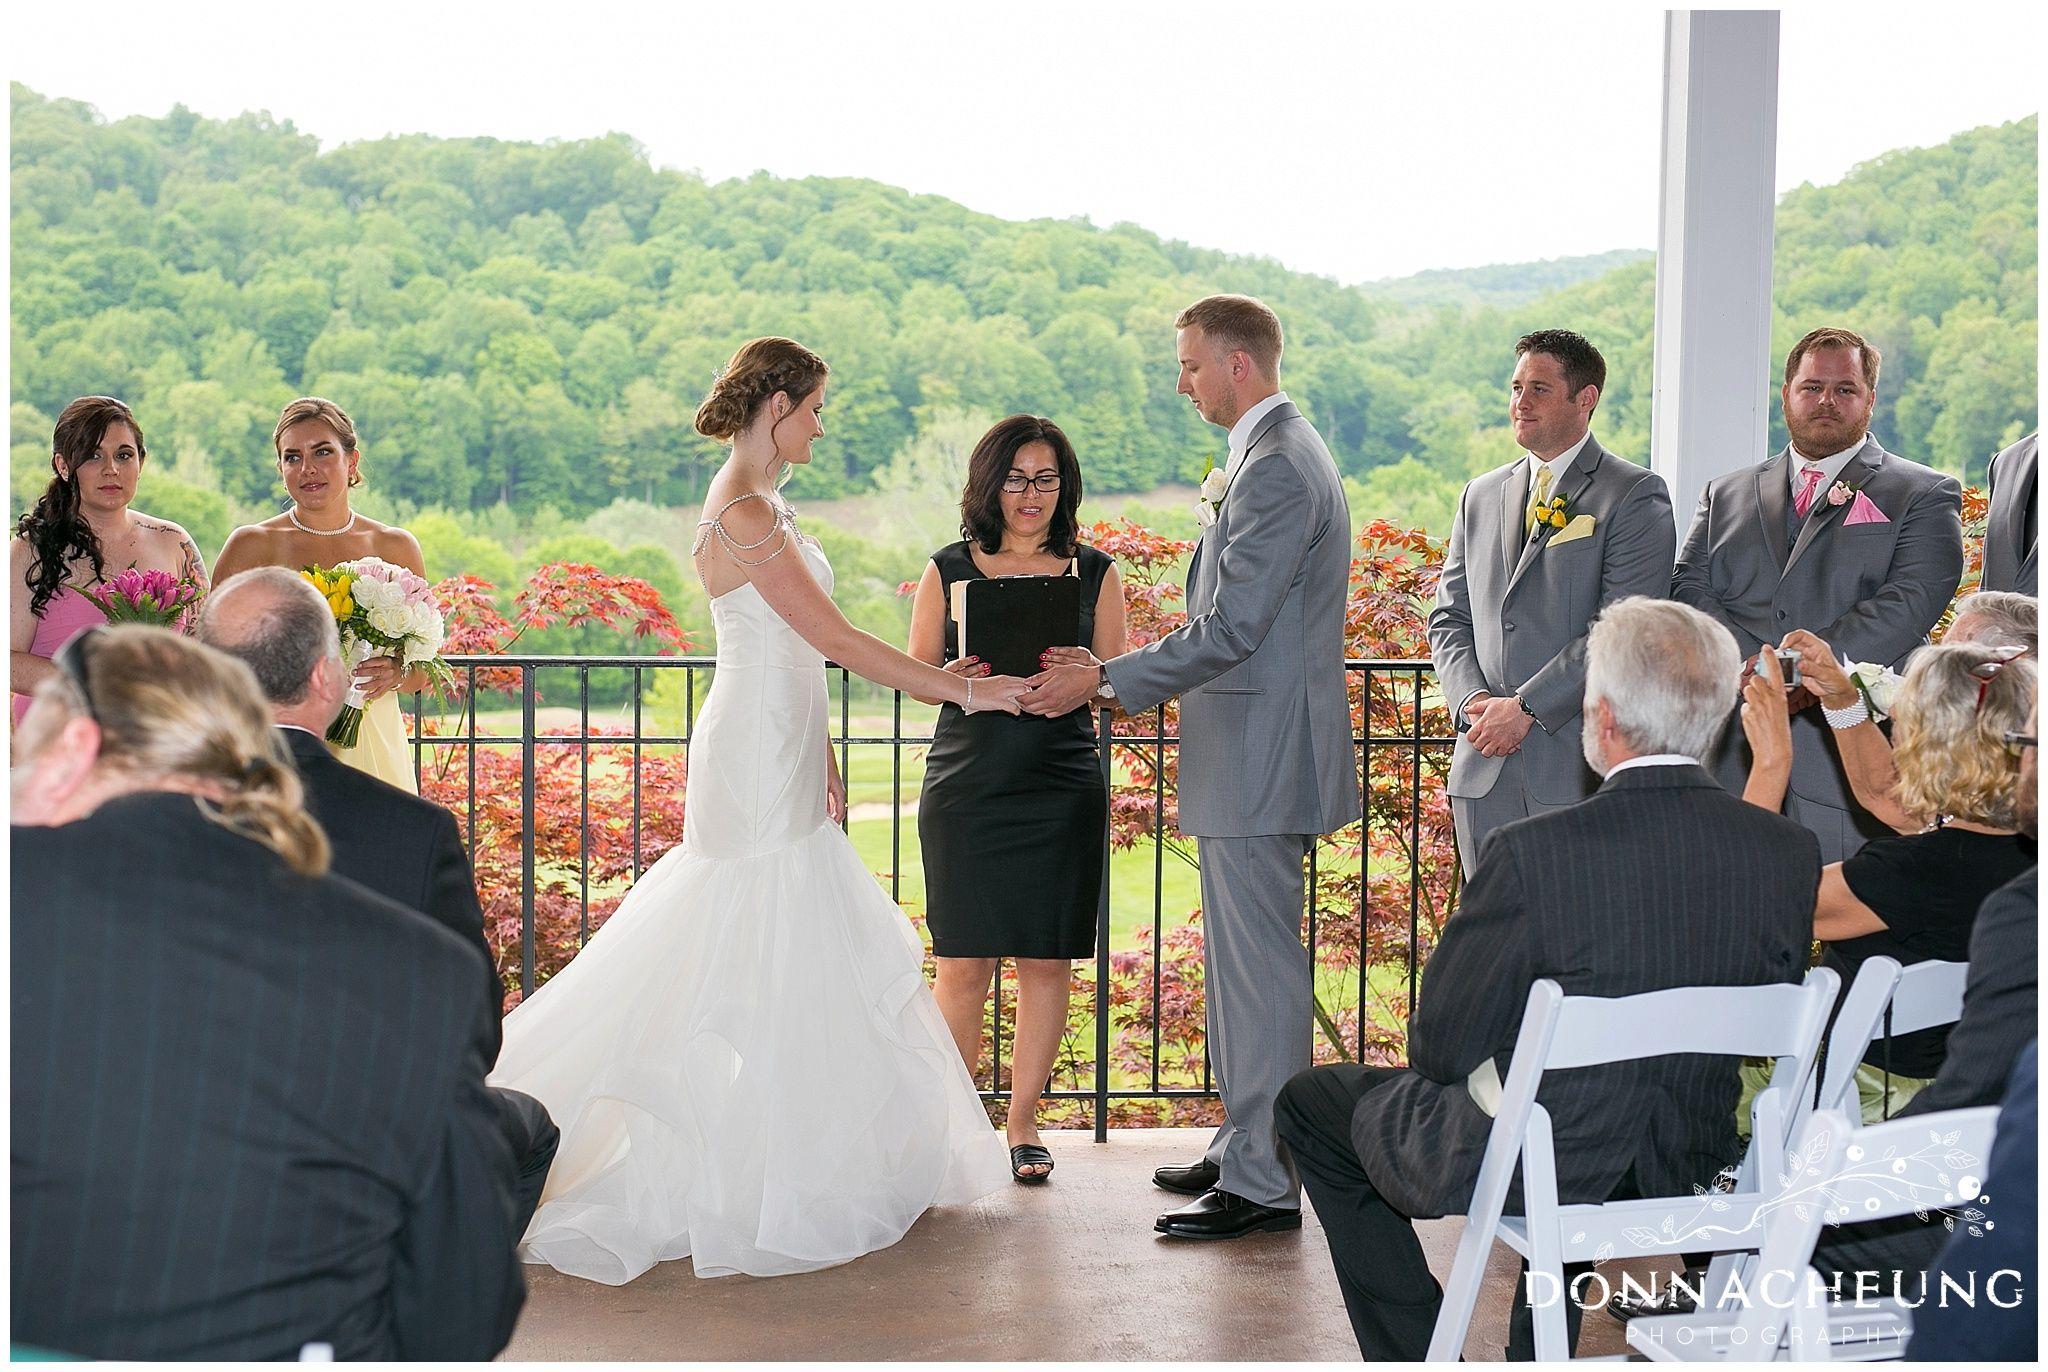 Sam lew hollowbrook golf club wedding donna cheung photography